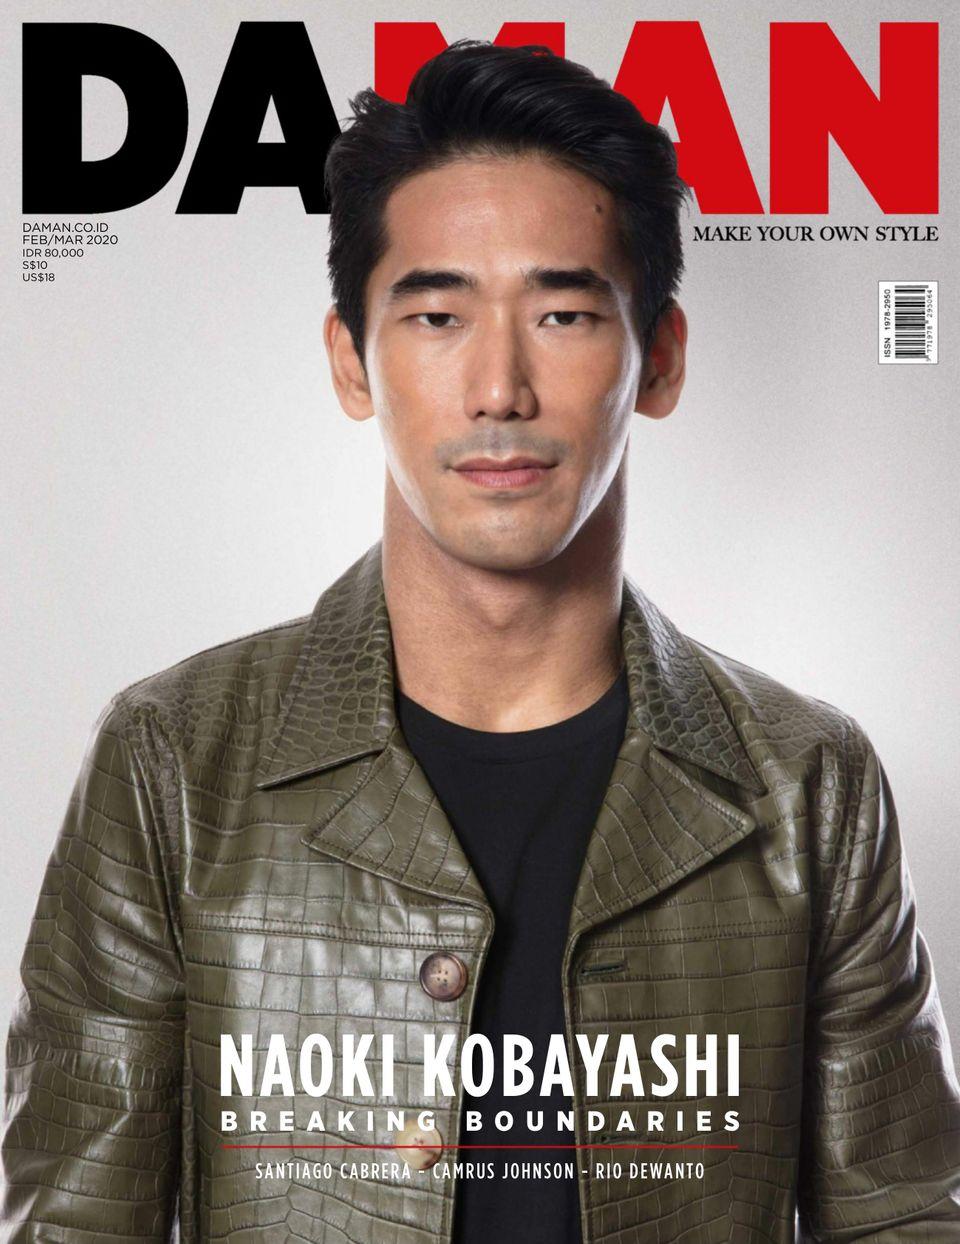 Da Man-December 2013 - January 2014 Magazine - Get your